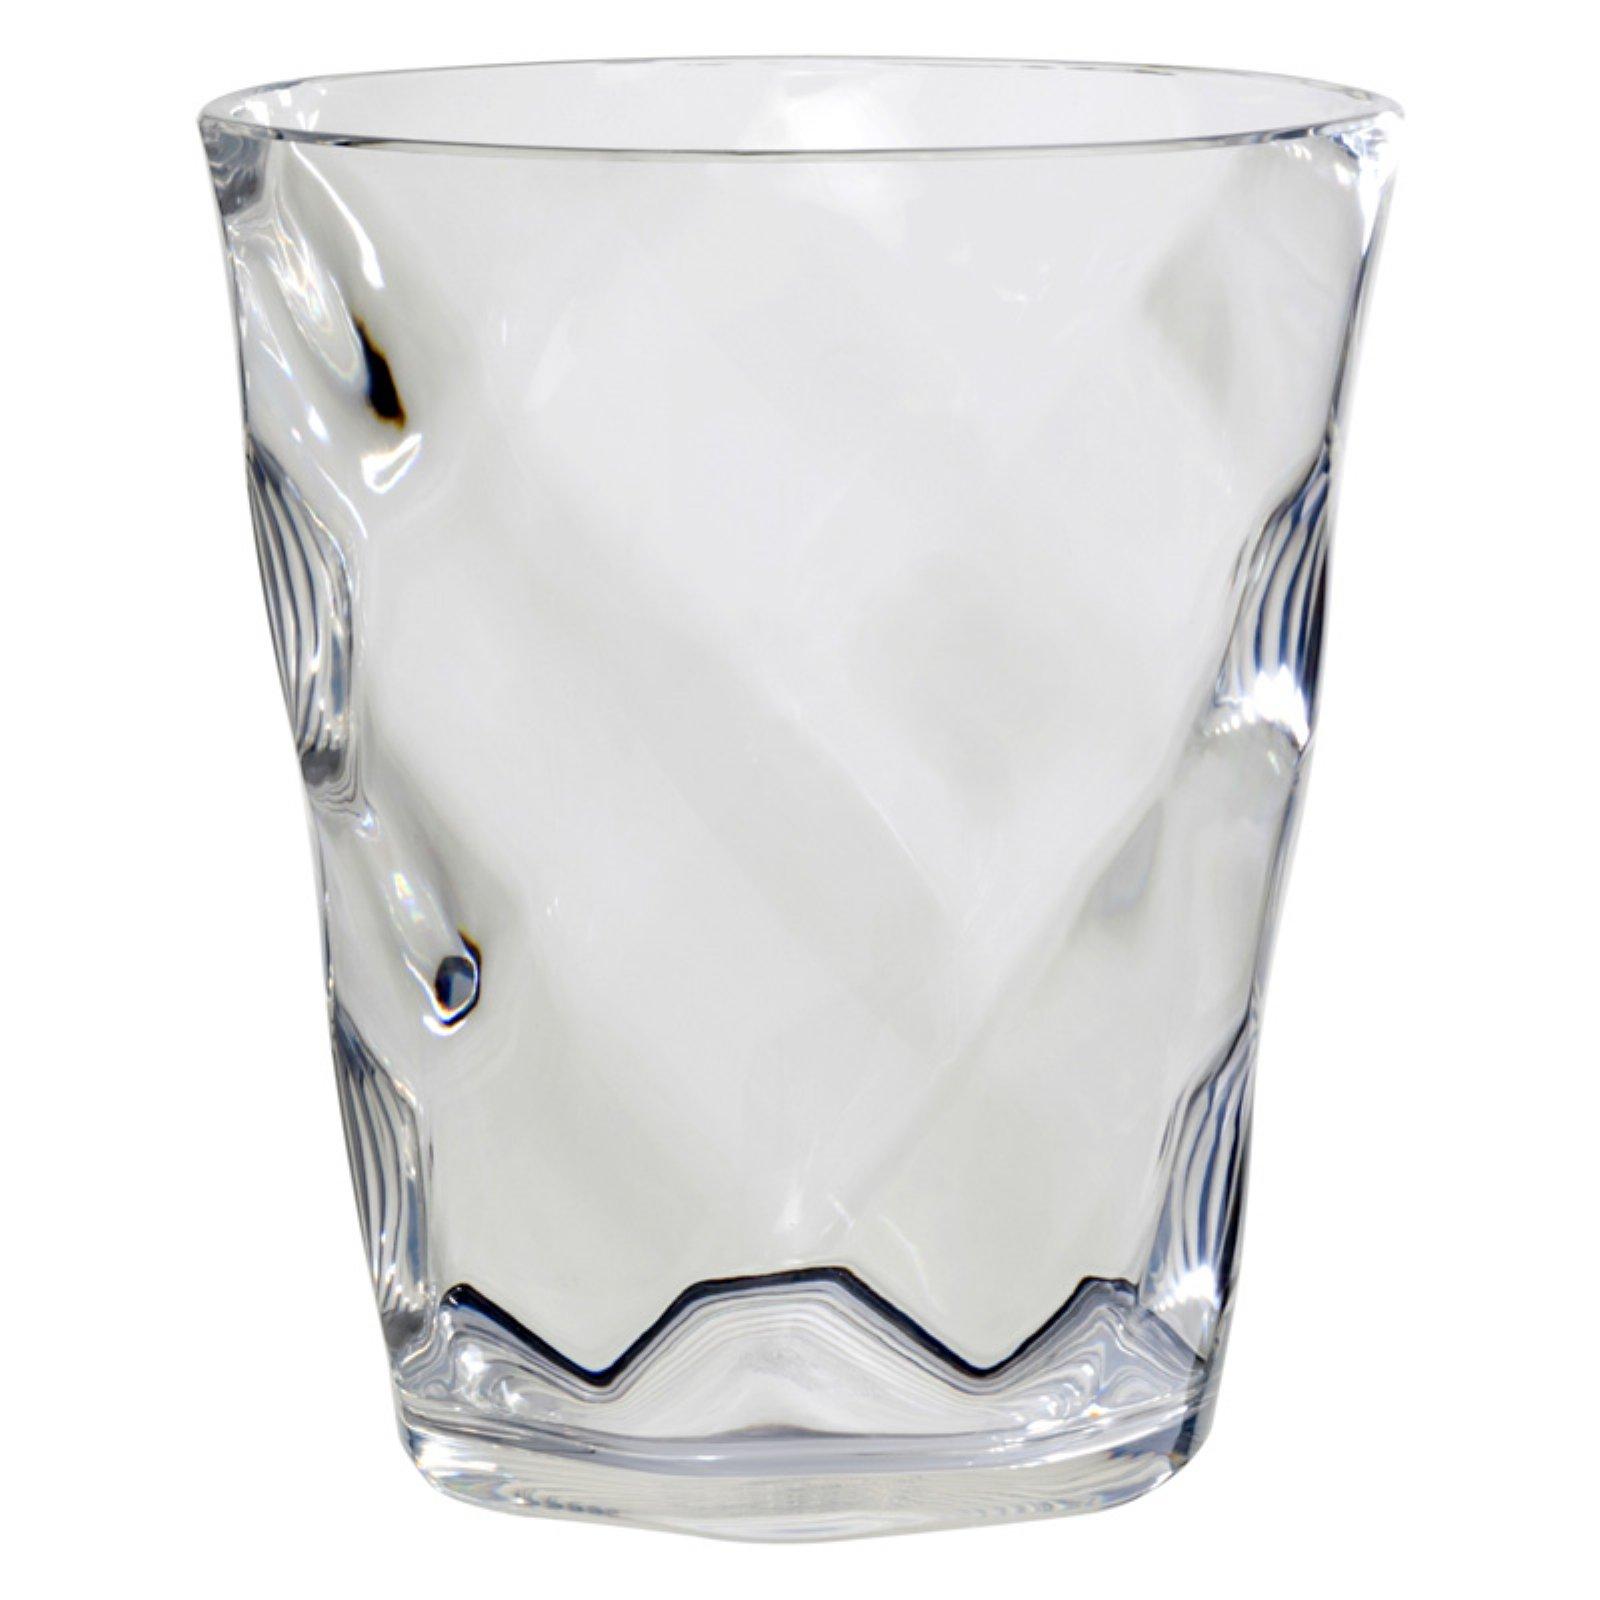 Glass Blocks Waste Basket